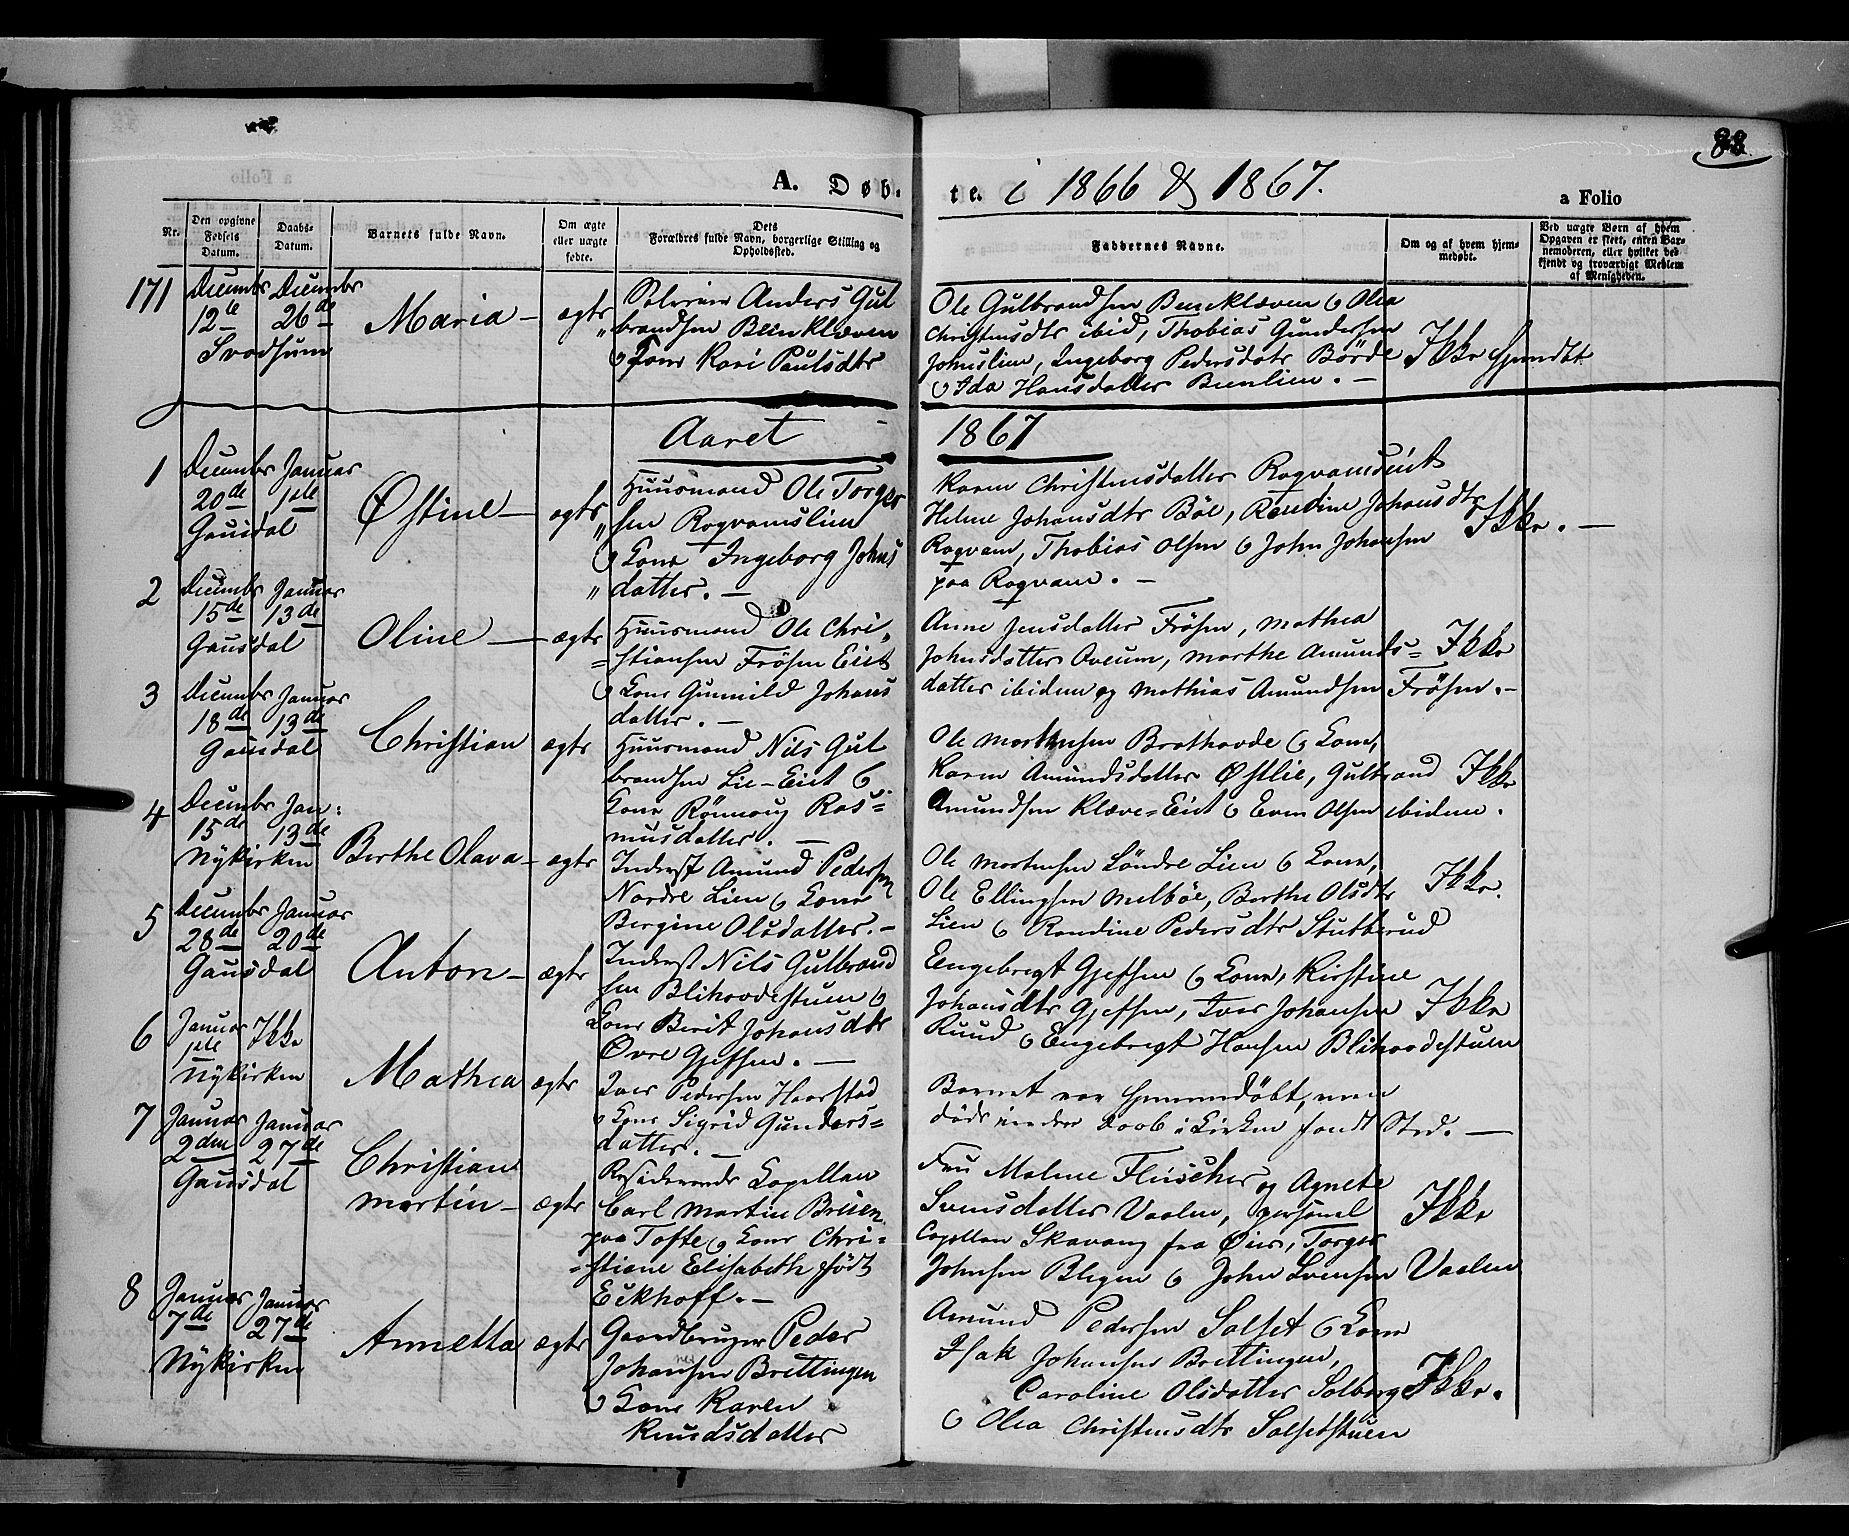 SAH, Gausdal prestekontor, Ministerialbok nr. 9, 1862-1873, s. 88